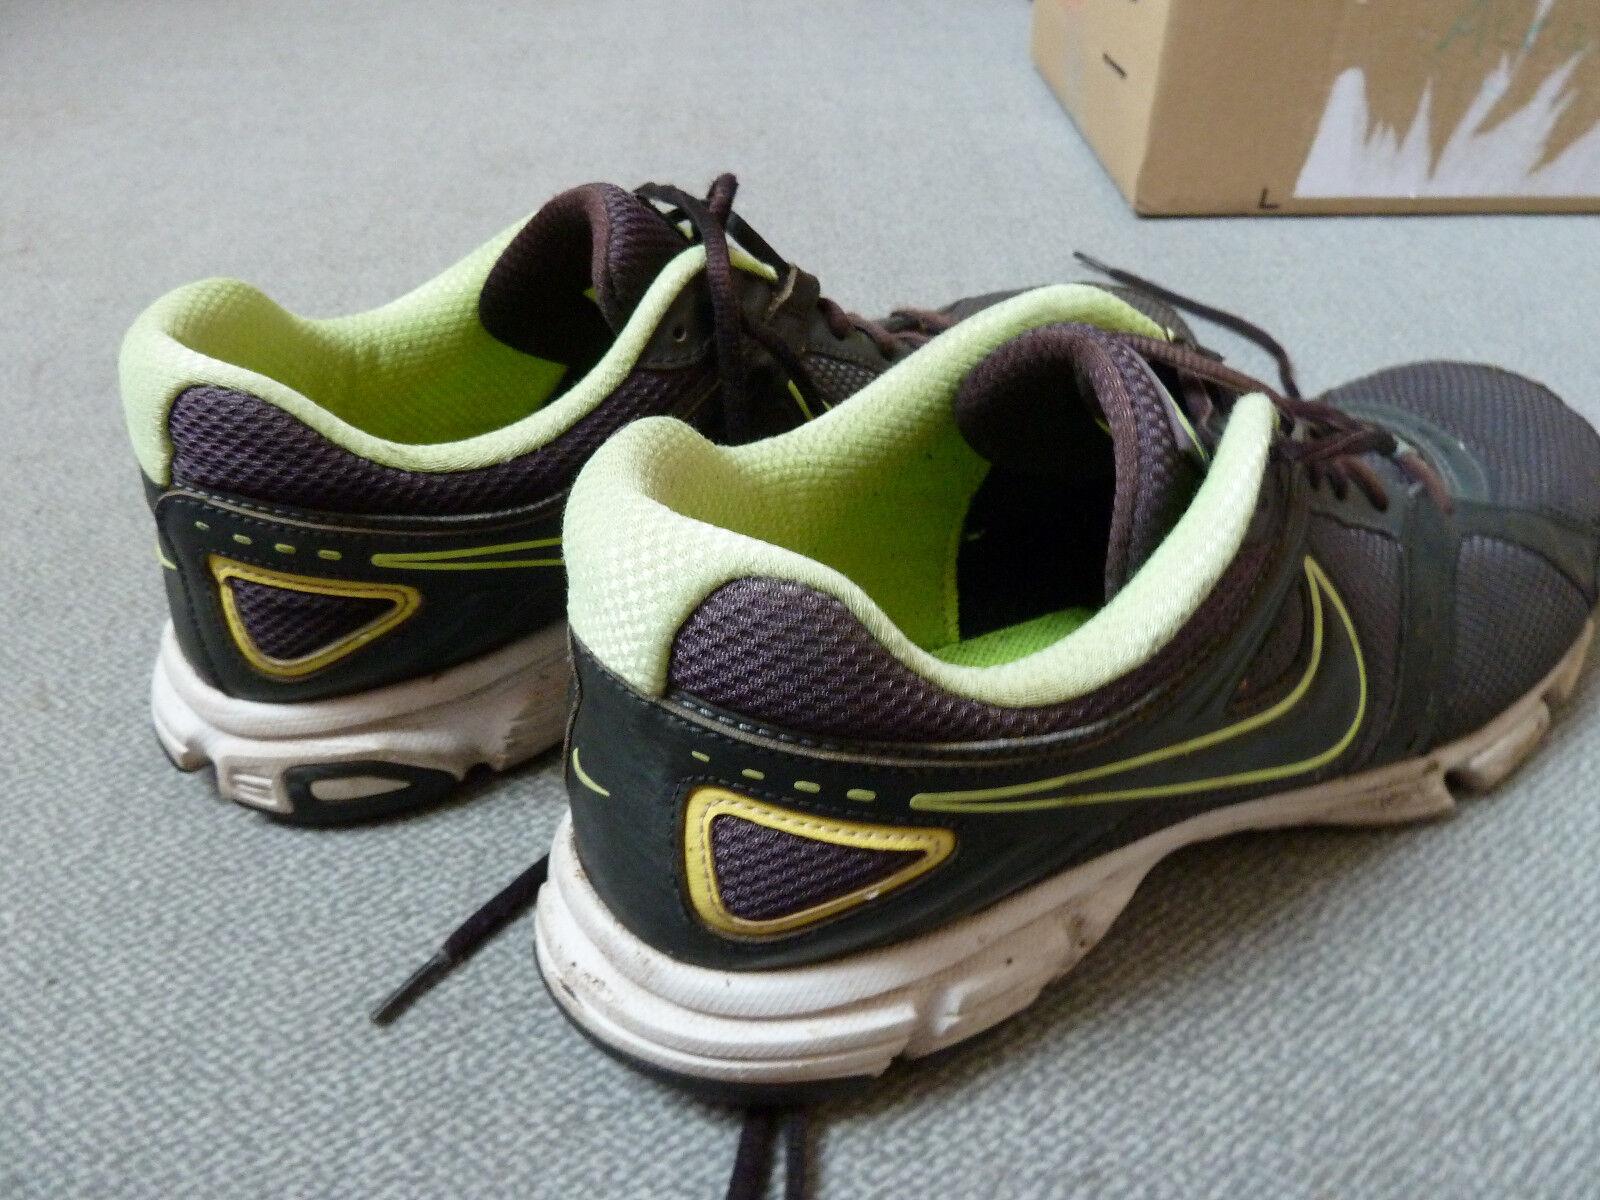 100 % Original NIKE Downshifter 4, Gr. 47,5 / US 13 / 31 cm - Nike # 472816-001